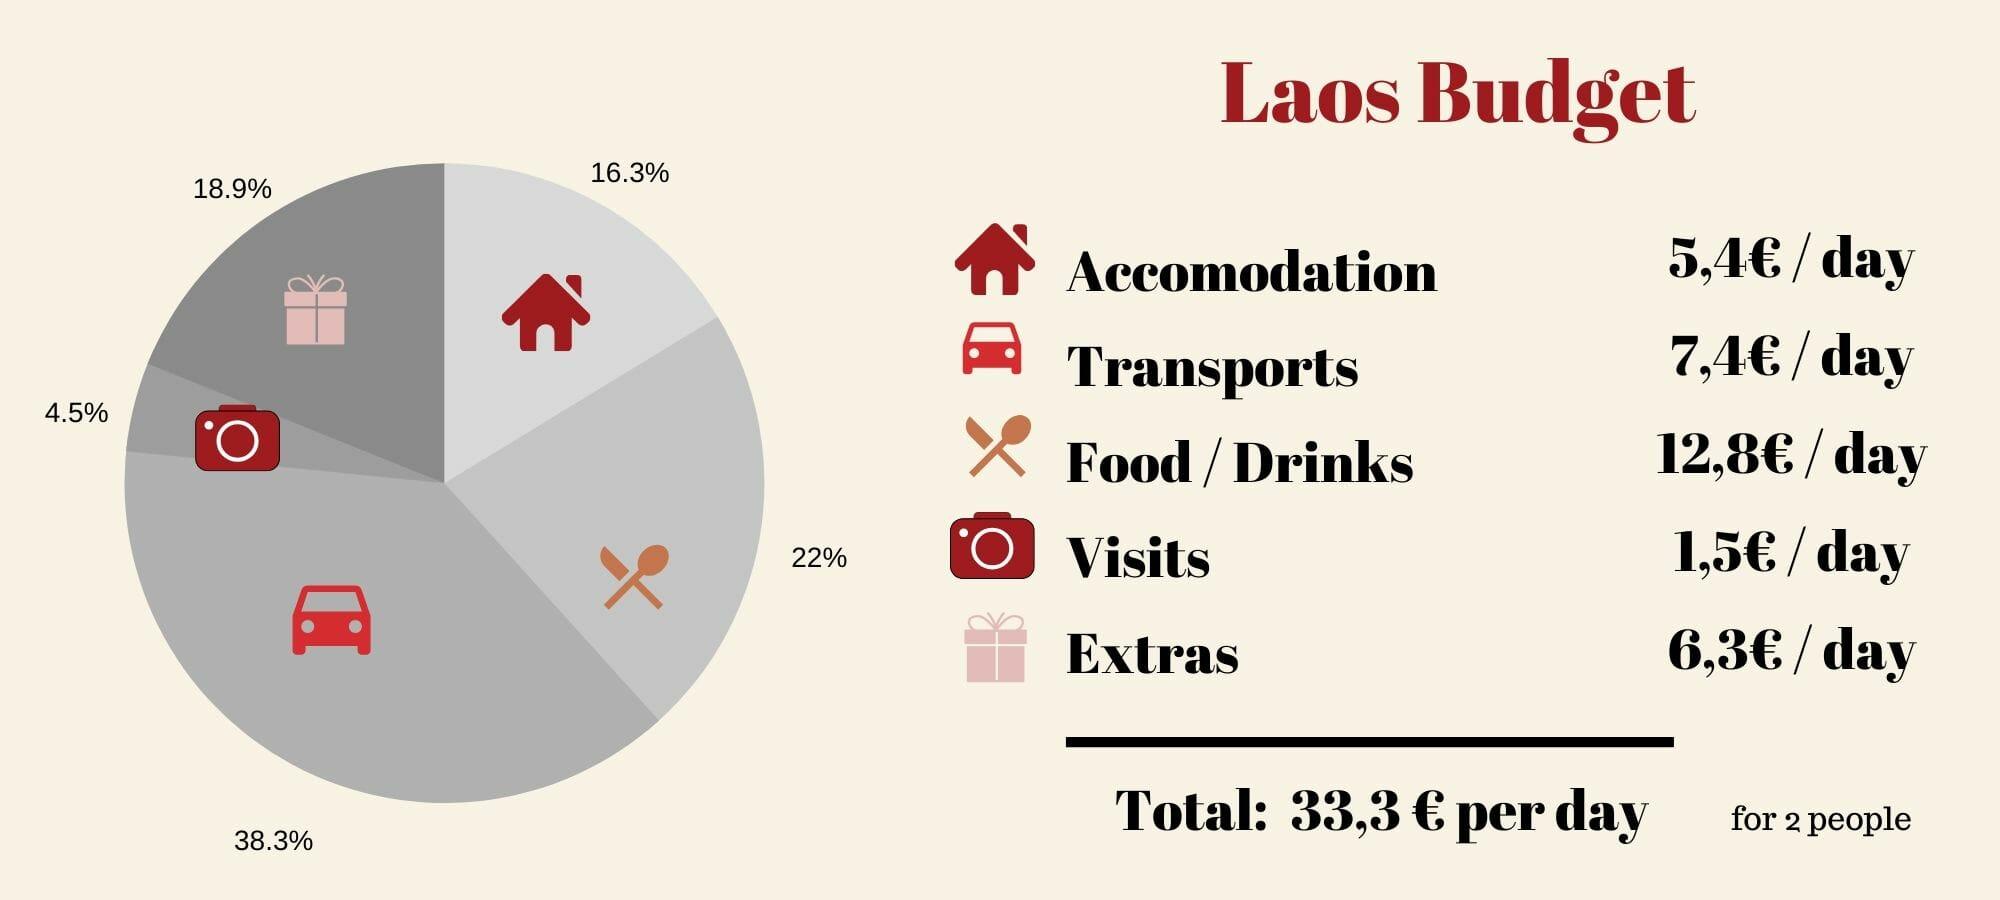 laos travel budget